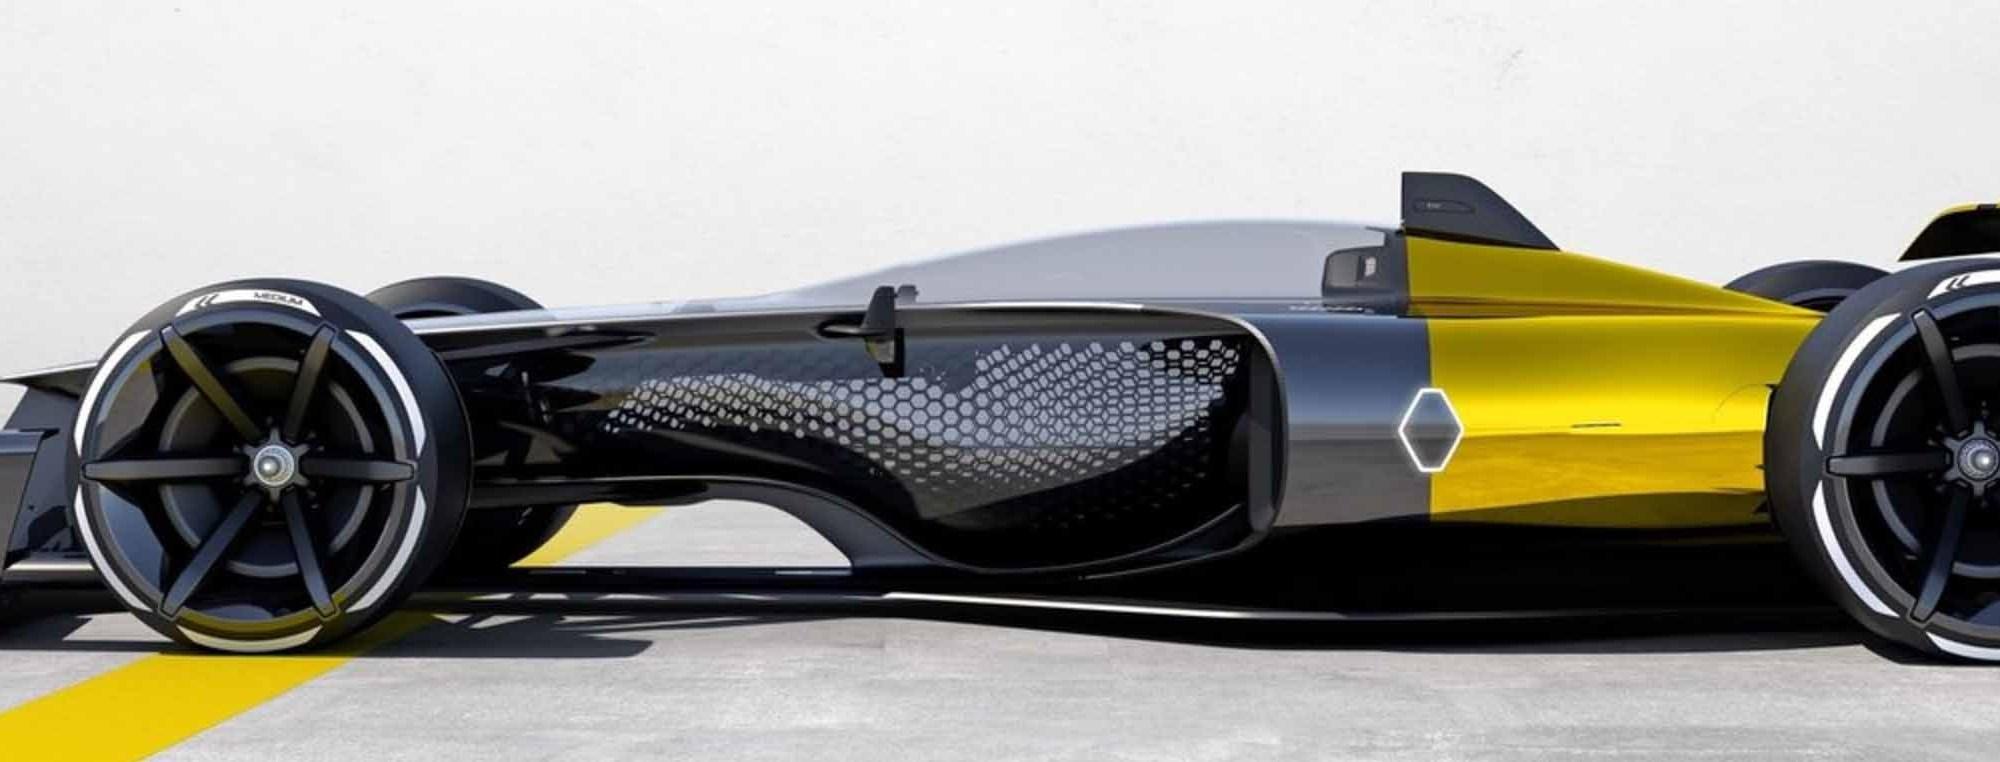 Renault Sport R.S. 2027 Vision